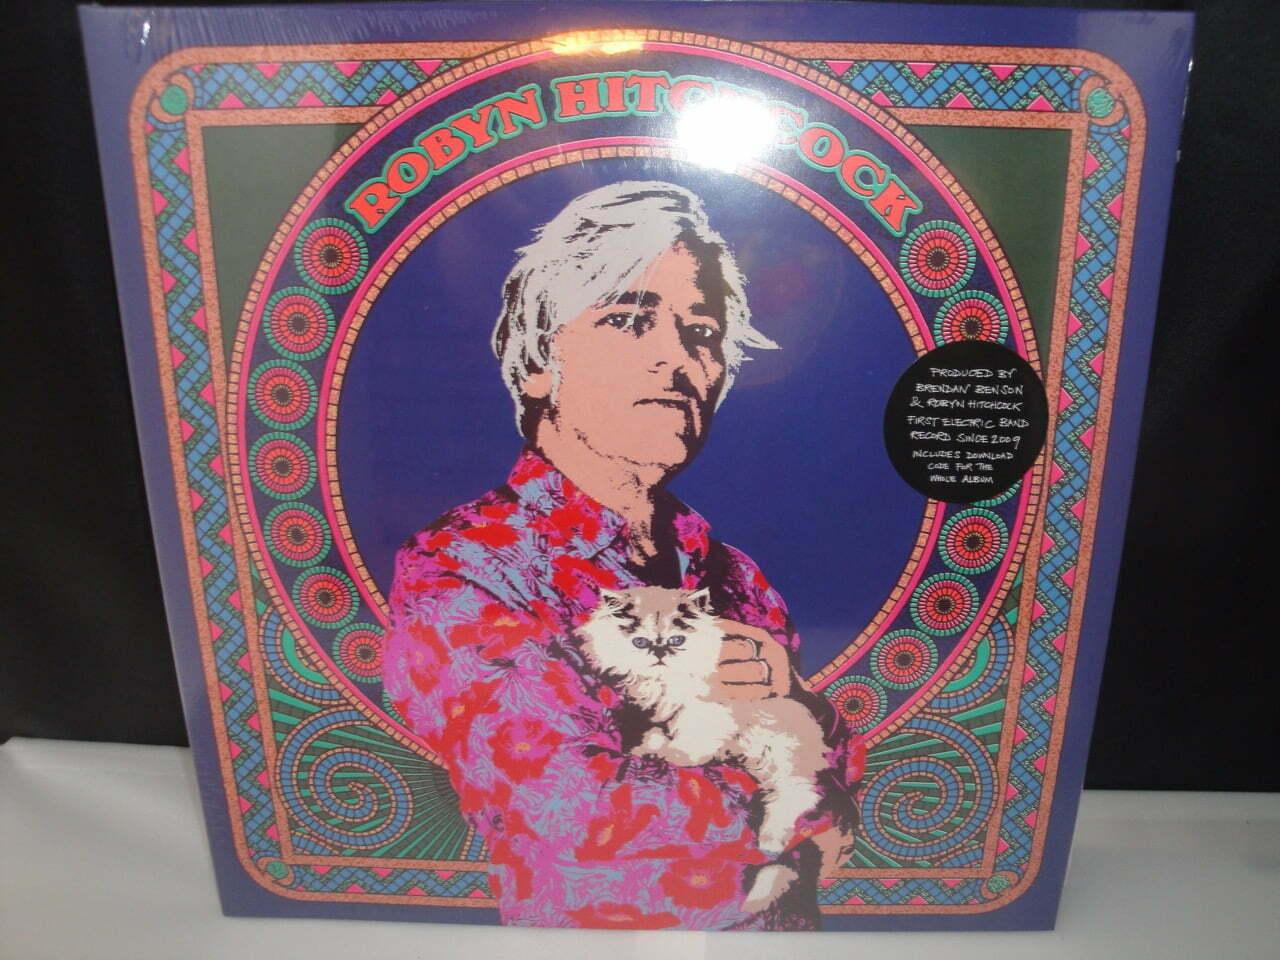 Robyn Hitchcock - Robyn Hitchcock - 2017 Vinyl LP - Yep Roc Records